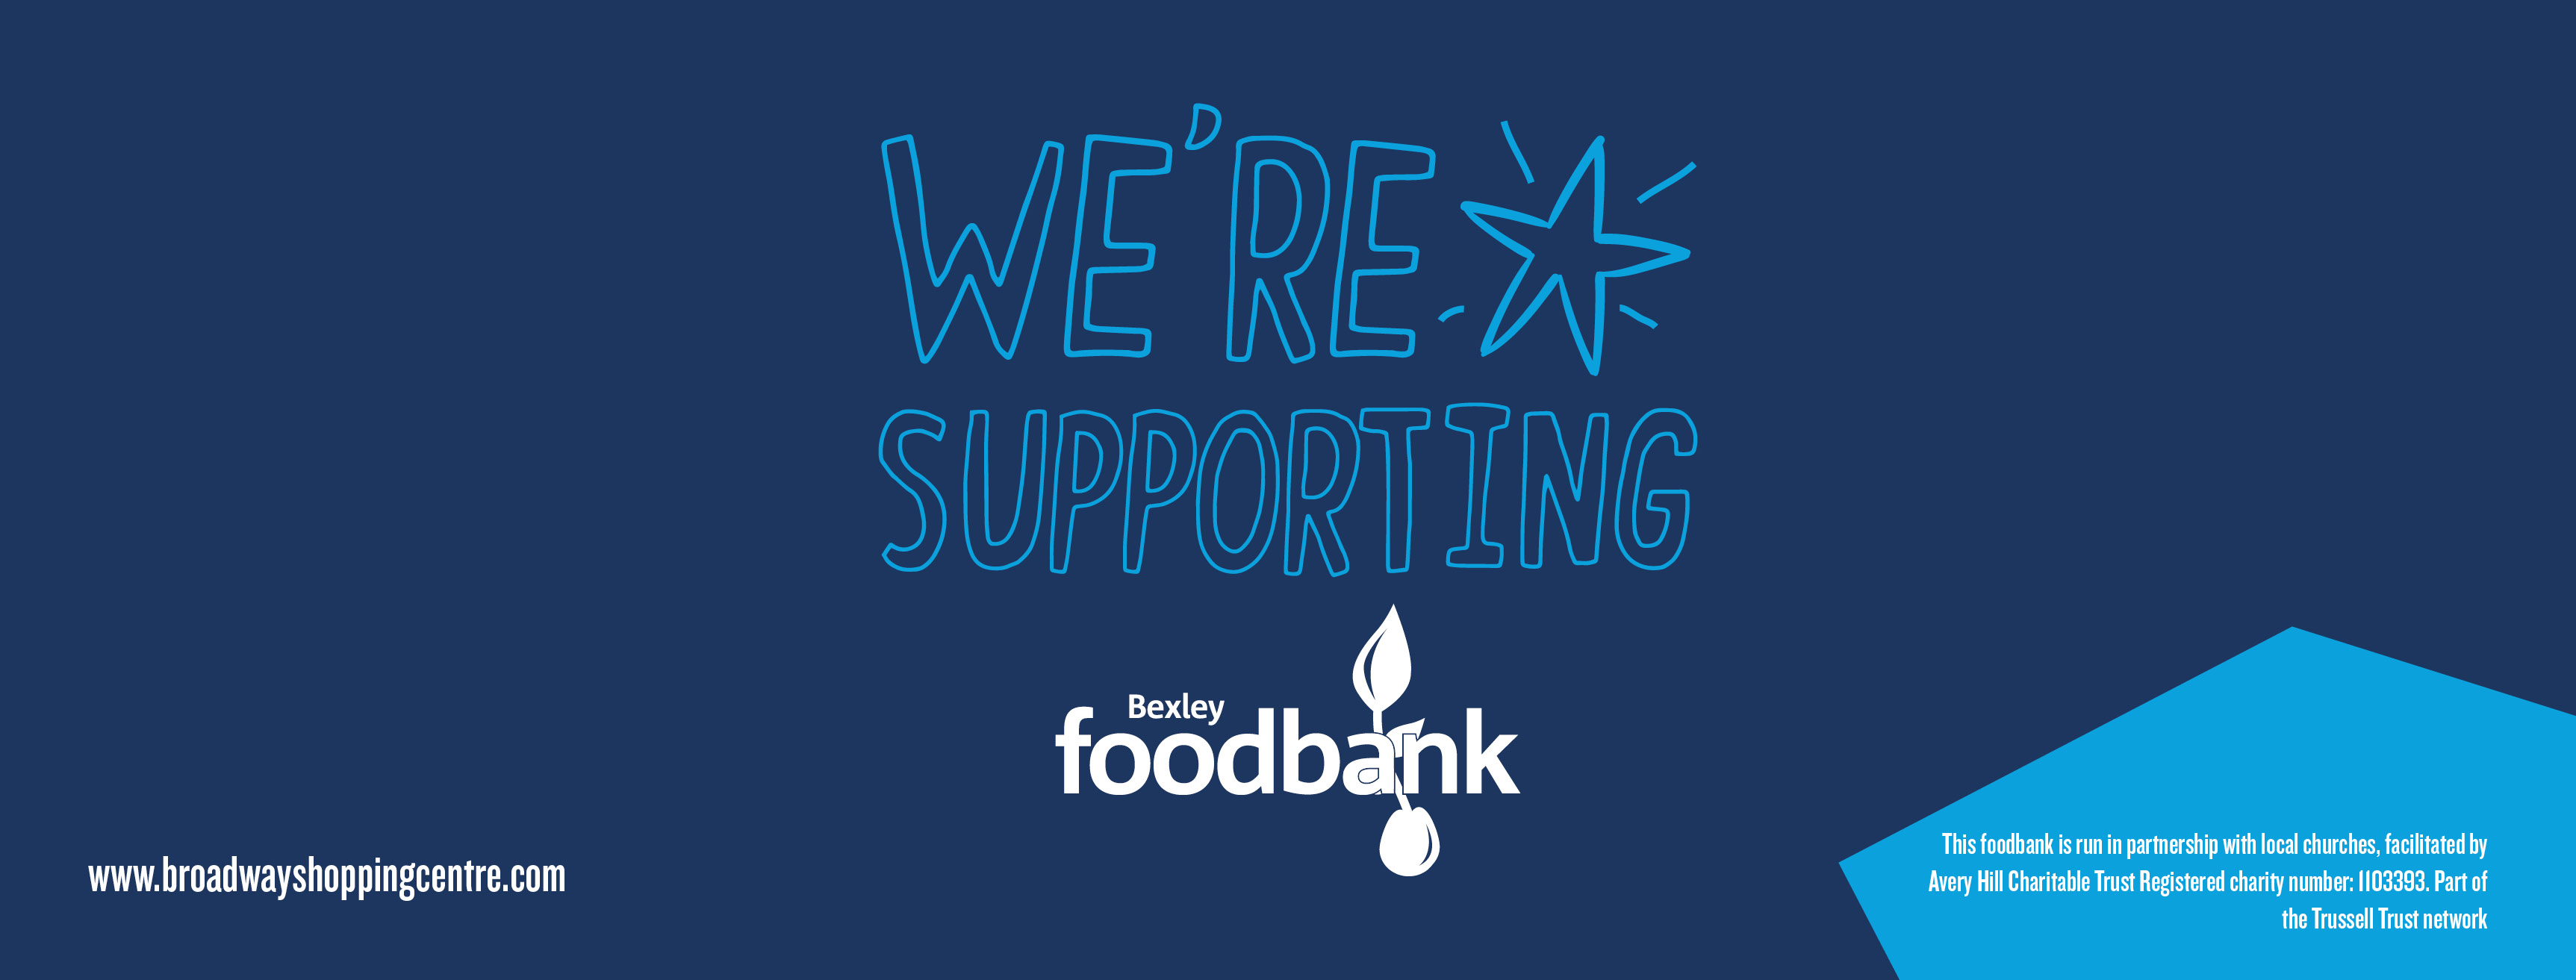 8. Foodbank – facebook banner